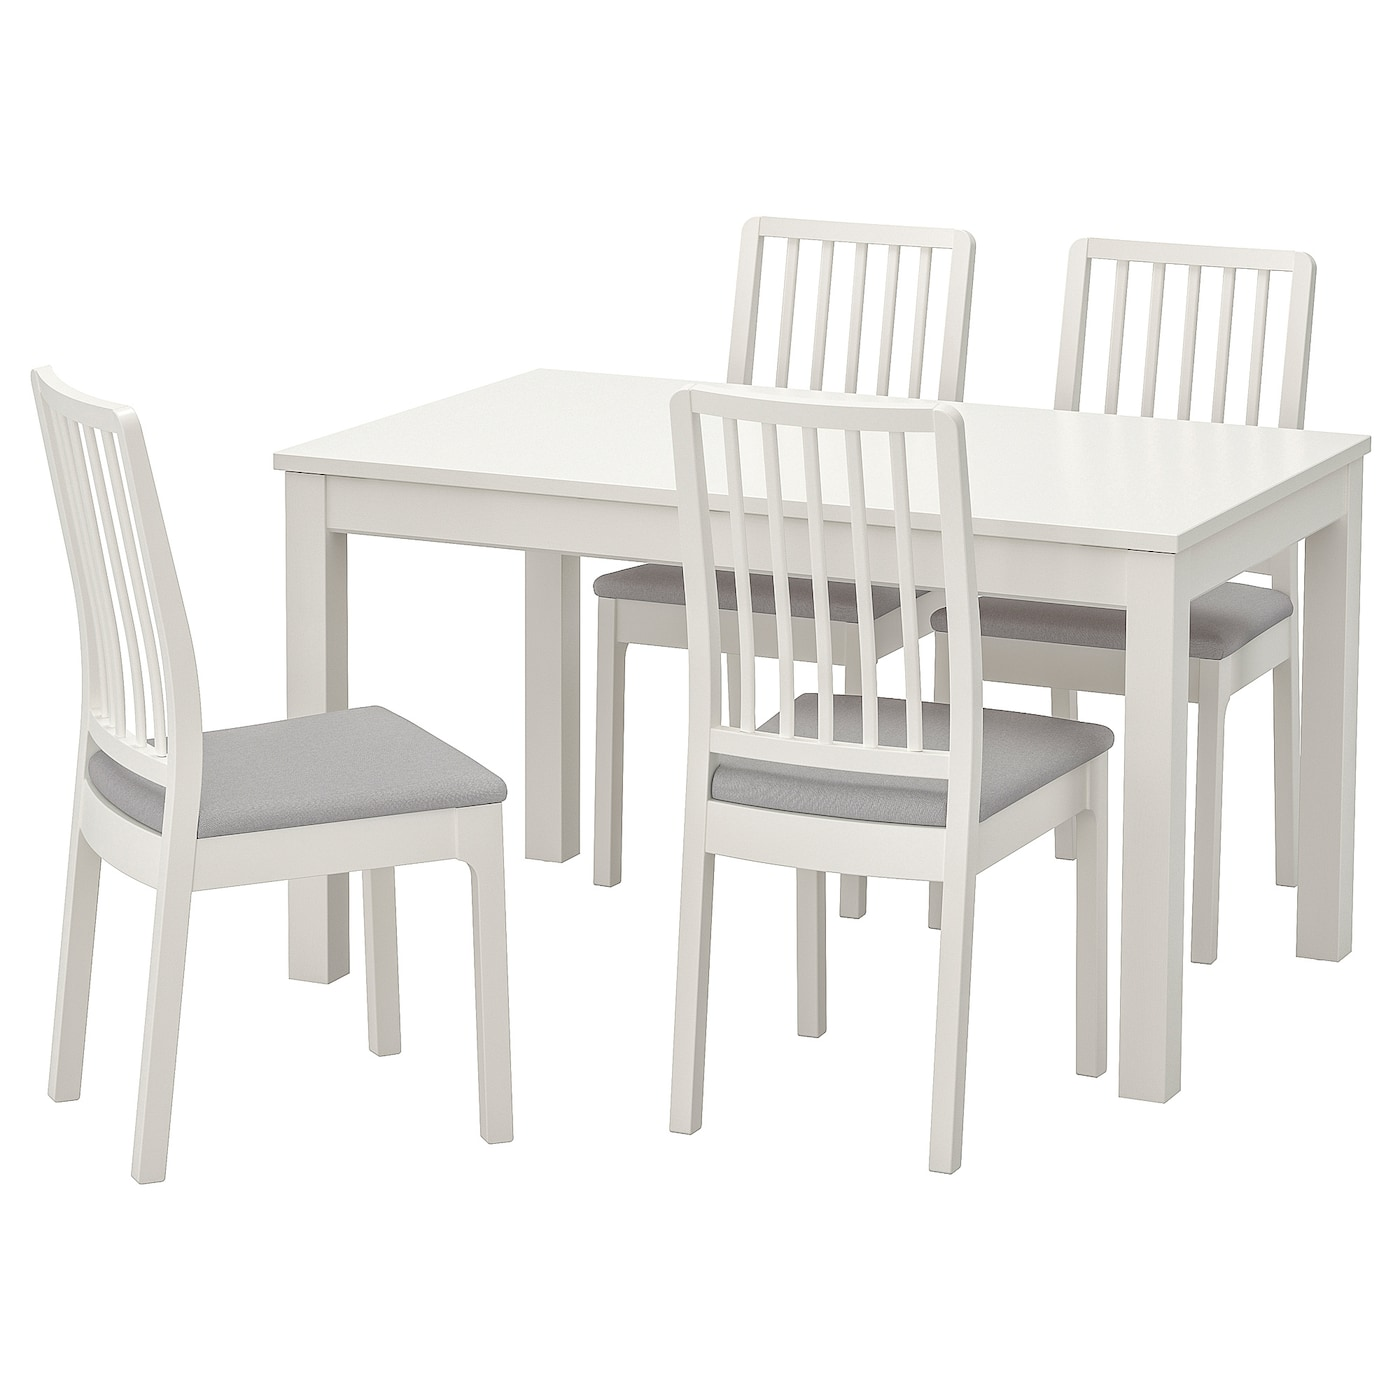 Laneberg Ekedalen Table And 4 Chairs White White Light Gray Ikea